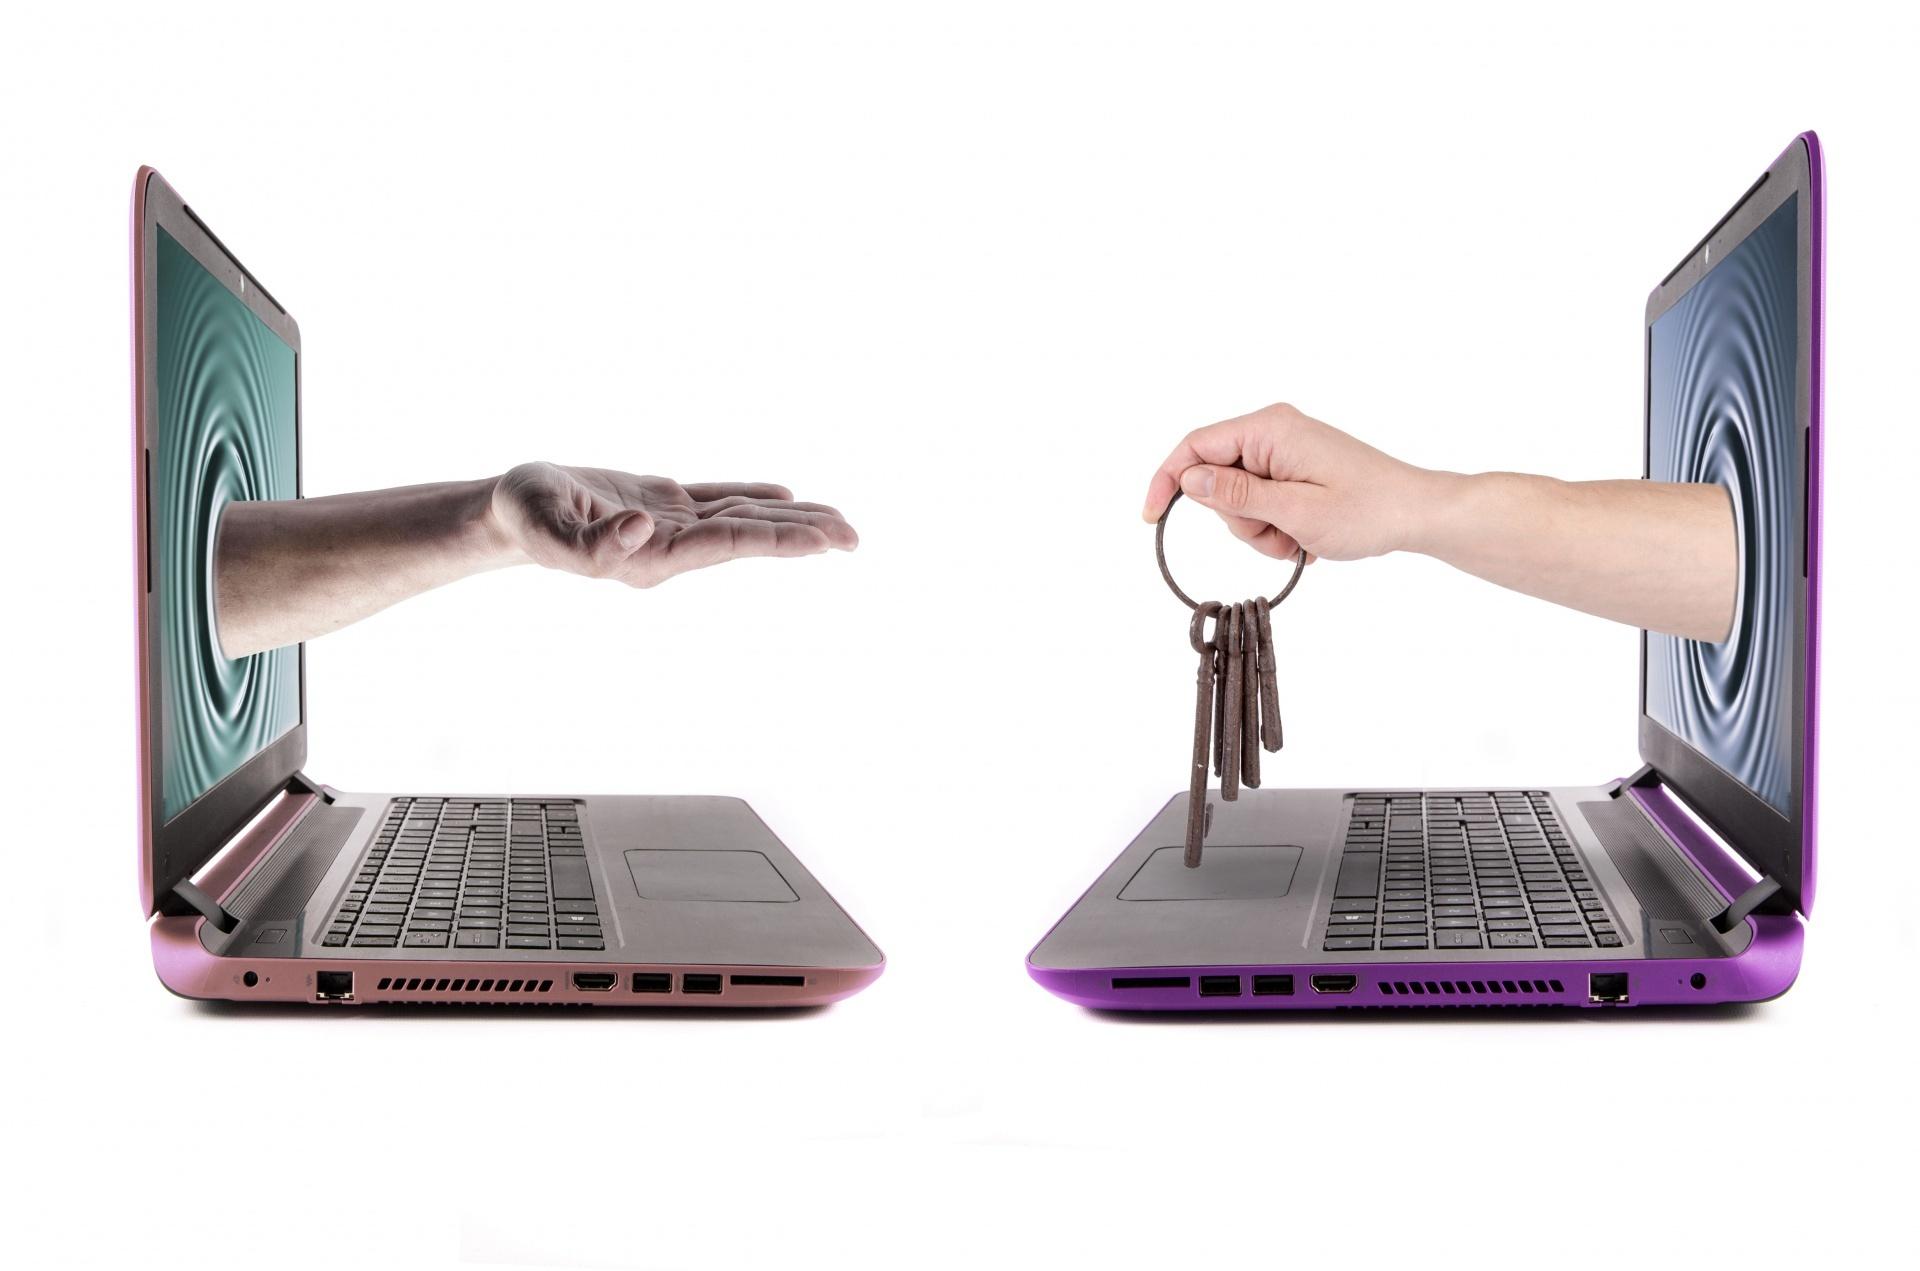 hand-holding-old-keys-1462981136Ul1-1